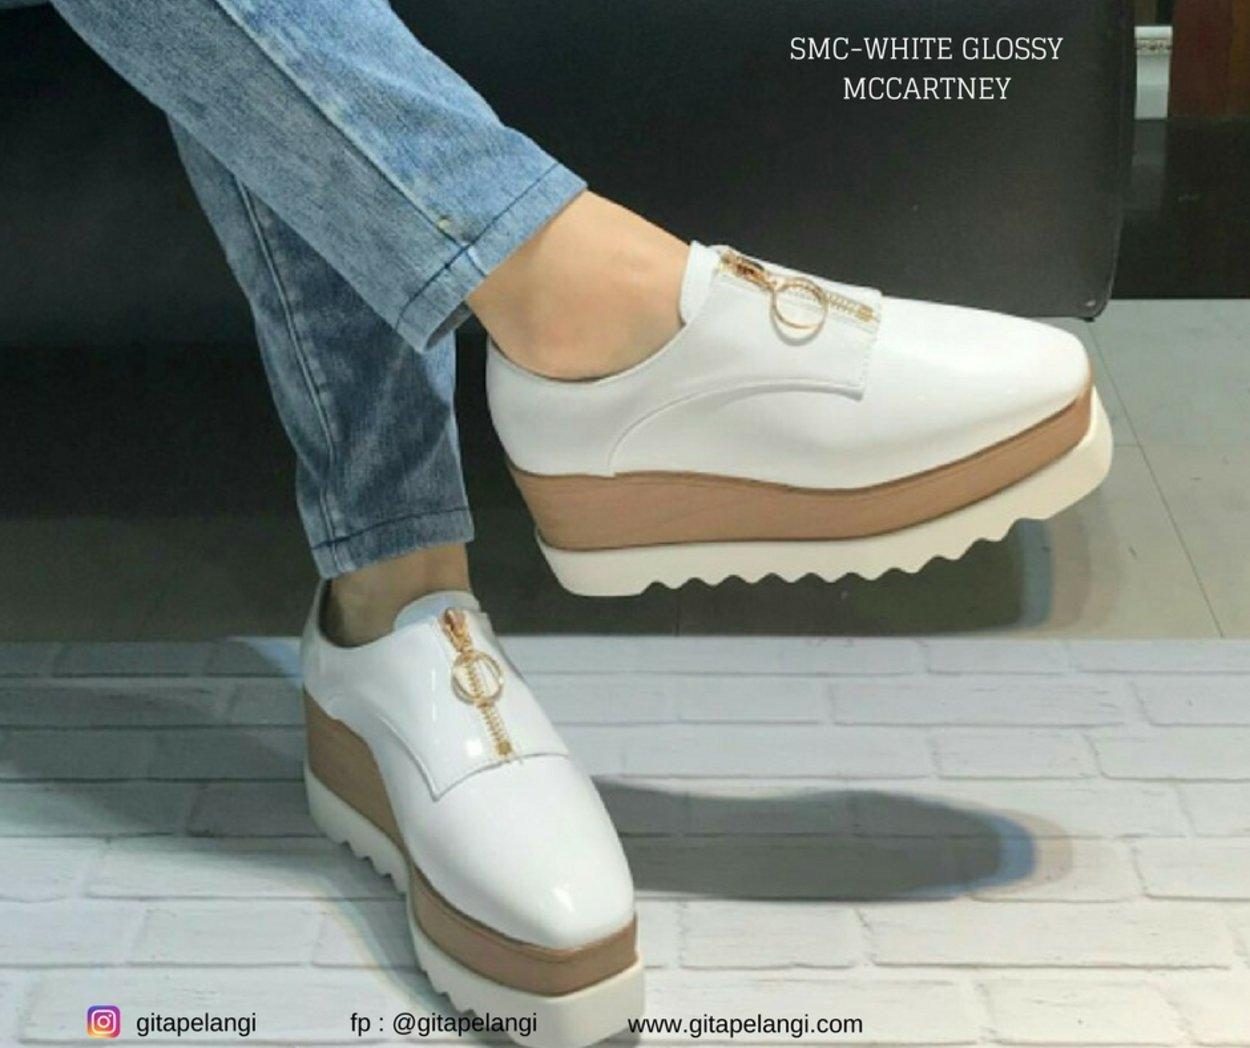 SMC WHITE GLOSSY